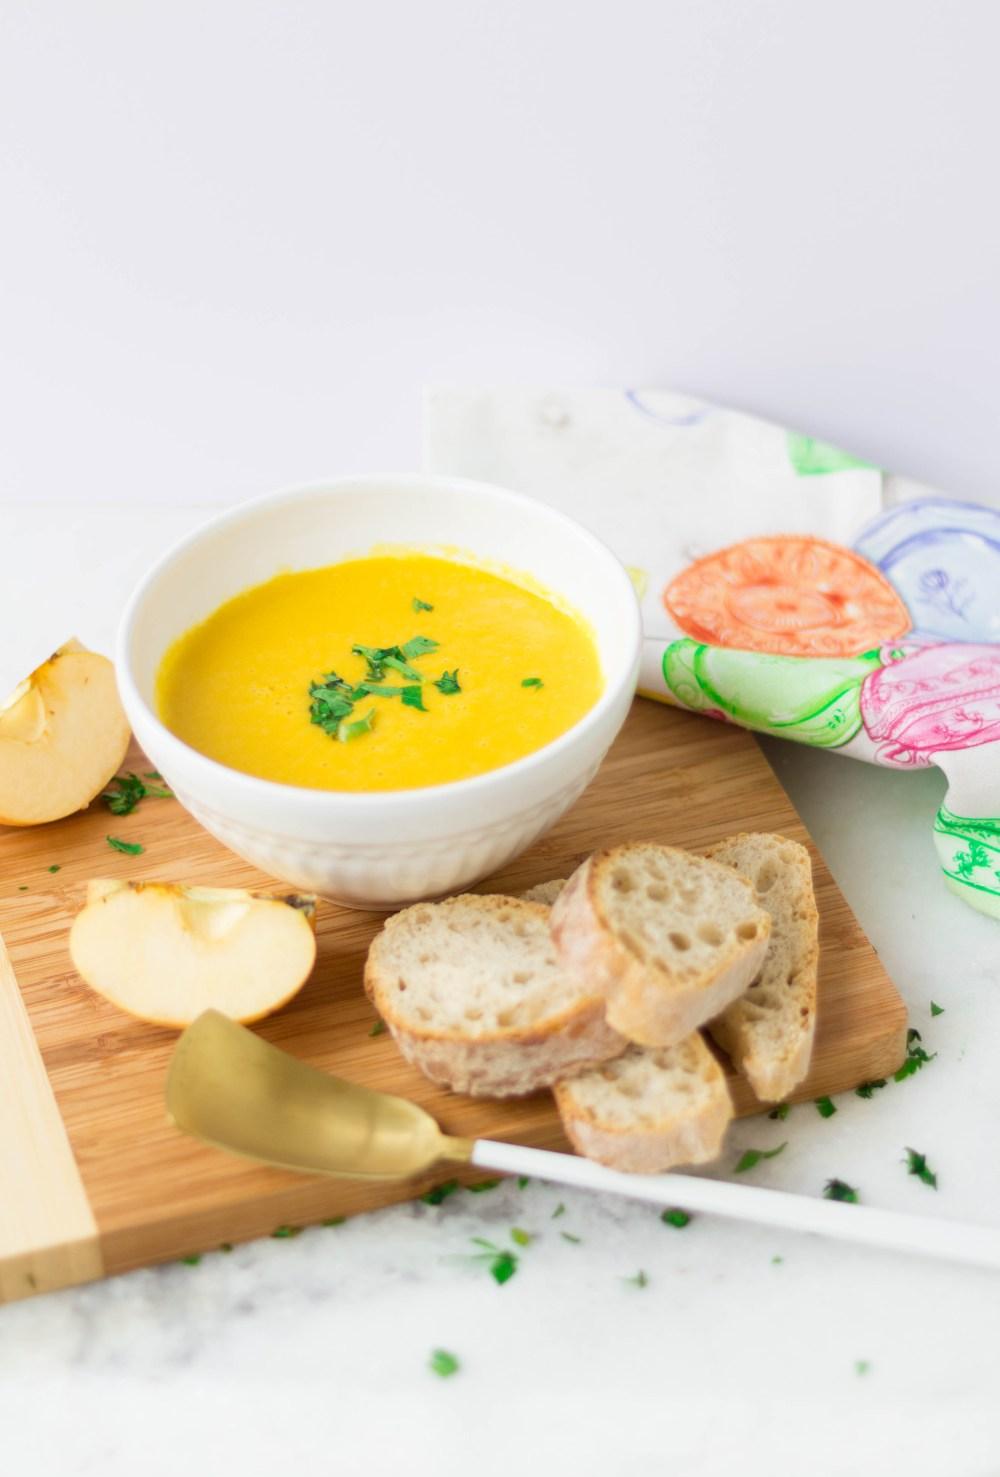 Sopa de Batata Doce, Cenoura e Maçã